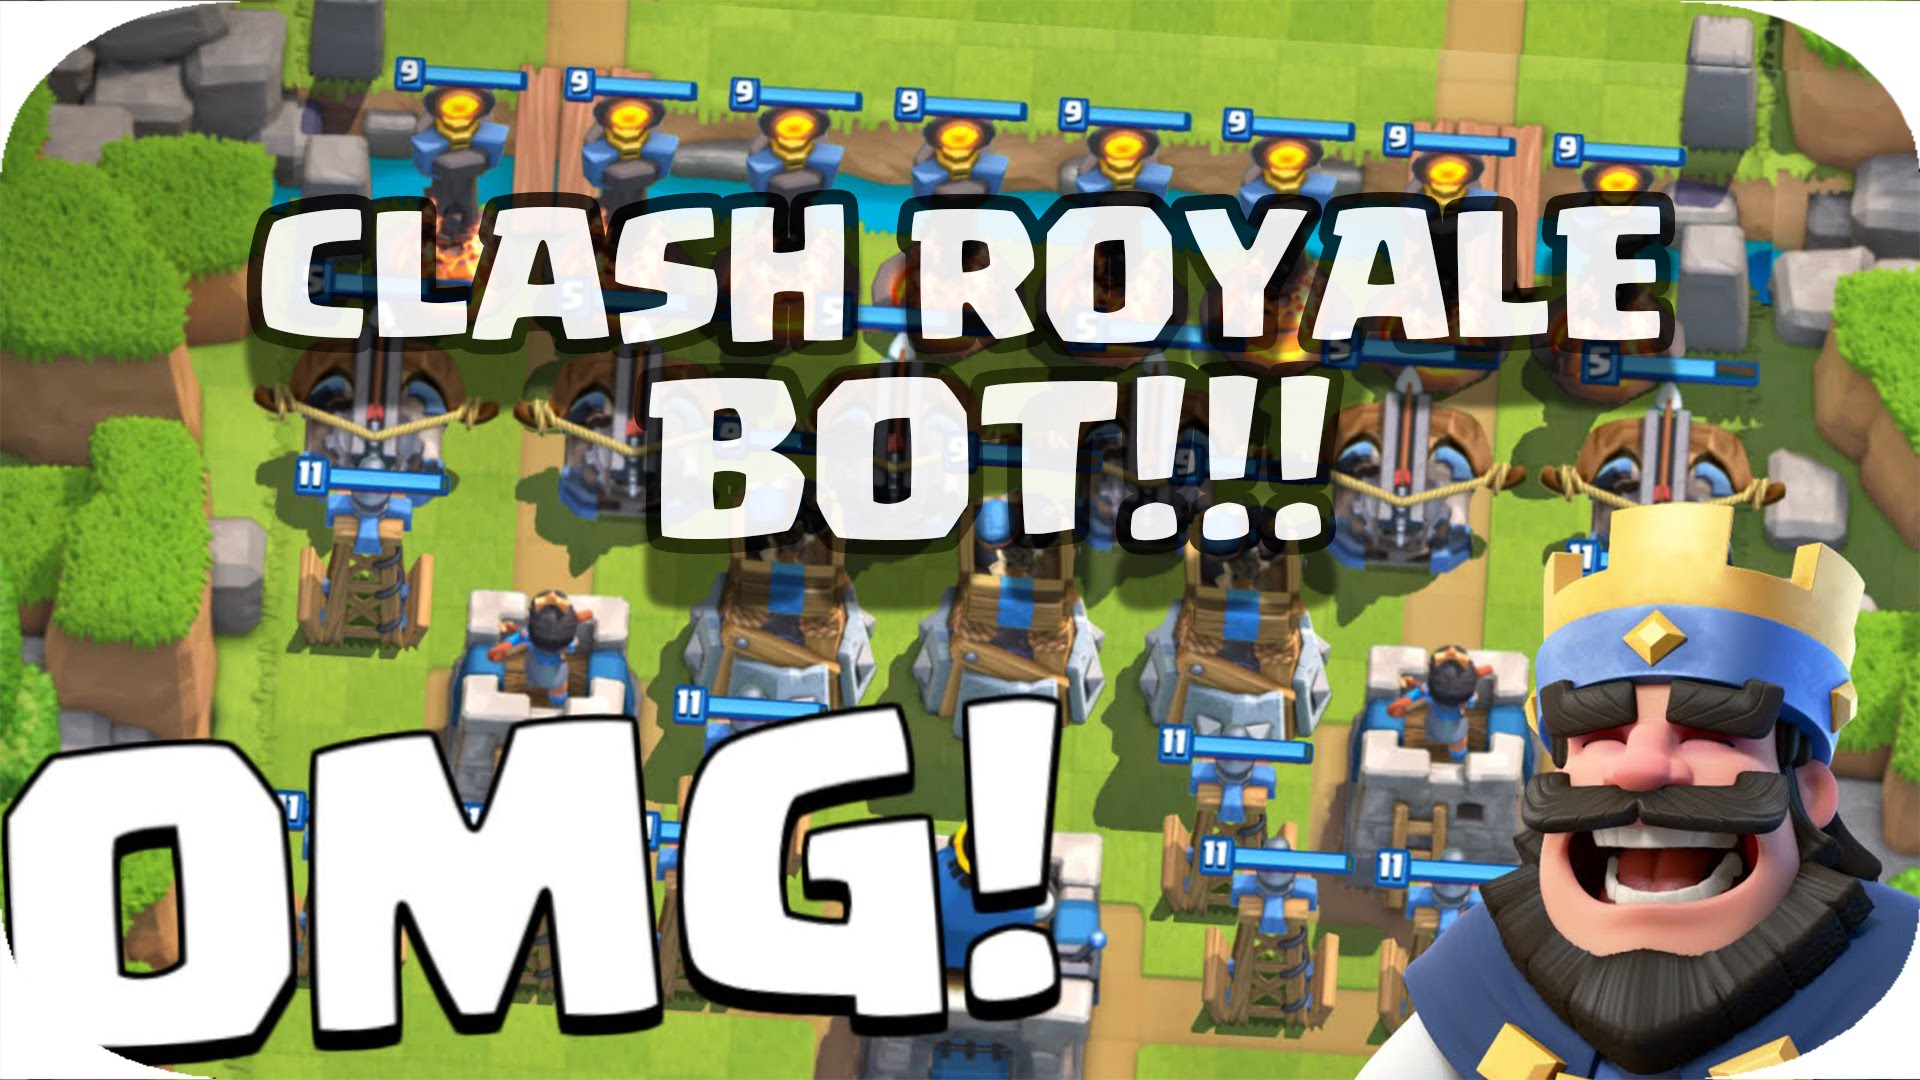 Clash Royale bot